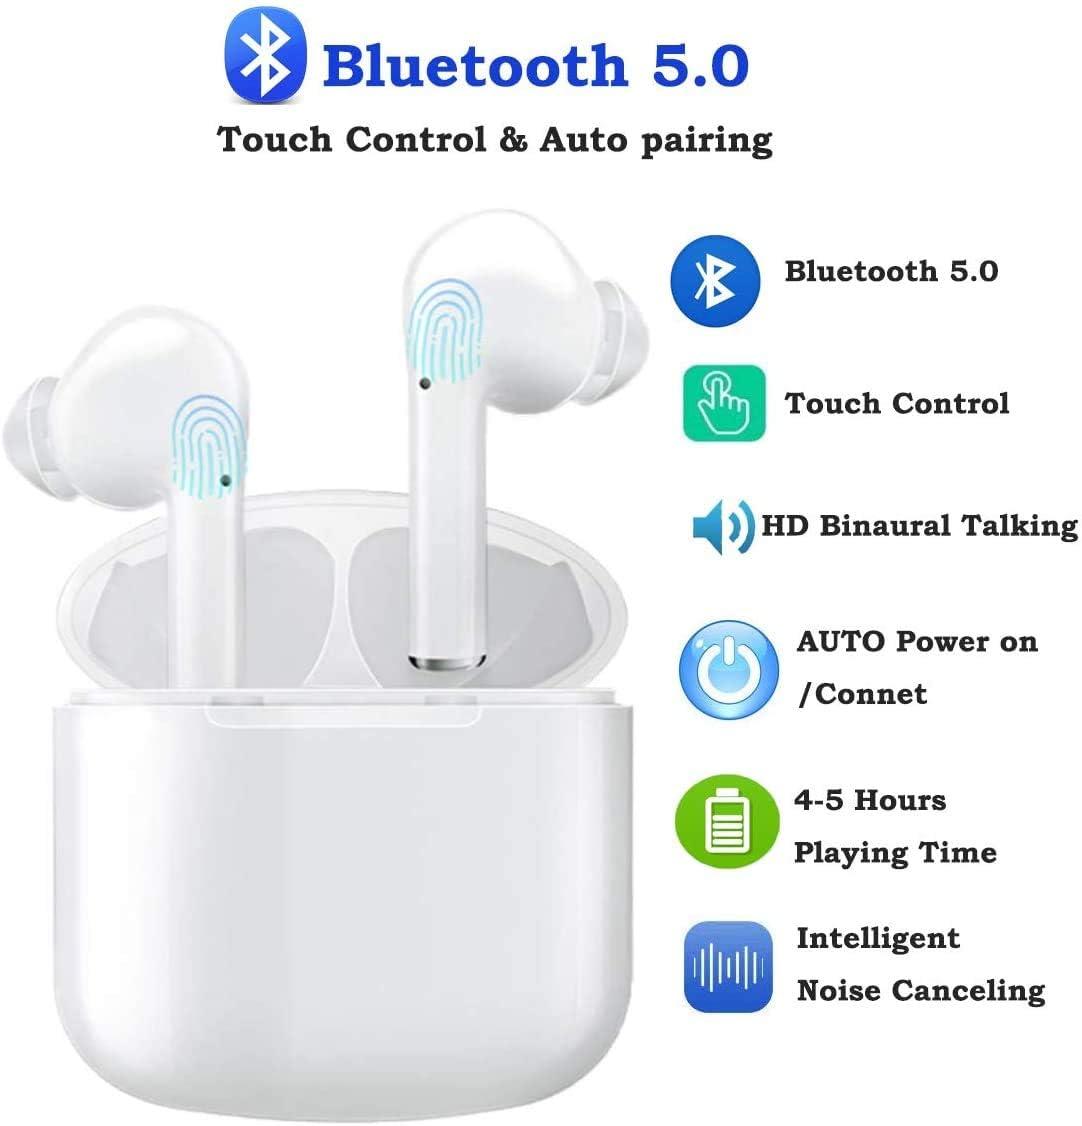 Maegoo Bluetooth Auriculares Inalámbricos 5.0, Bluetooth In-Ear Auriculares Cancelación Ruido Mini TWS Auriculares Micrófono Incorporado con Estuche Carga 24H Playtime para iPhone y Android